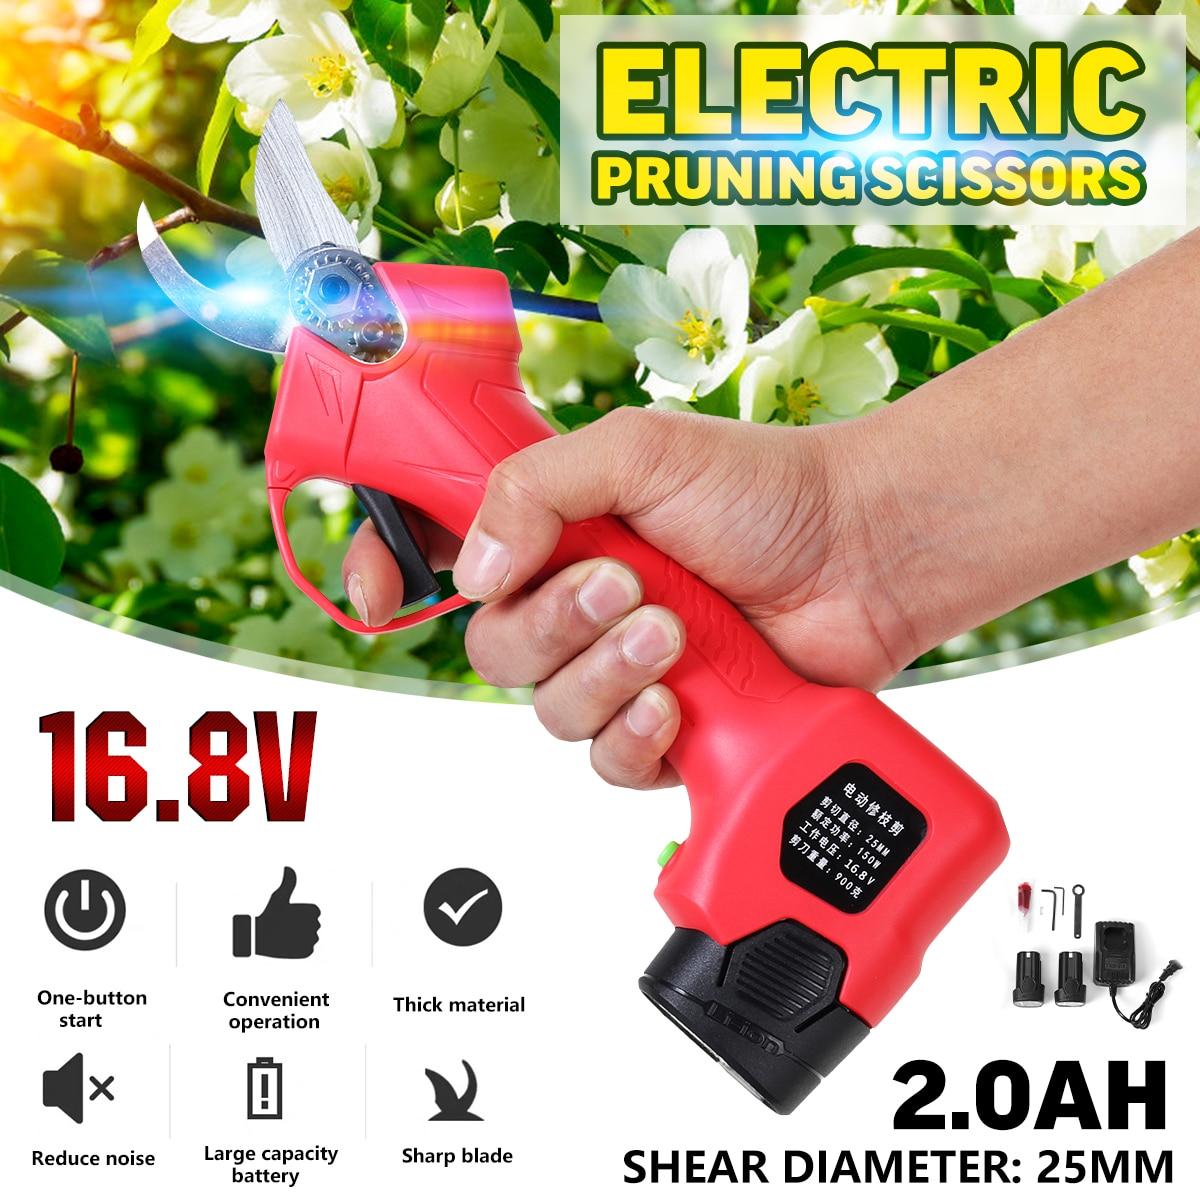 Doersupp 16.8V Wireless 25mm Electric Rechargeable Scissors Pruning Scissors Branch Cutter  Shears Tree Garden Tool W/2x Battery